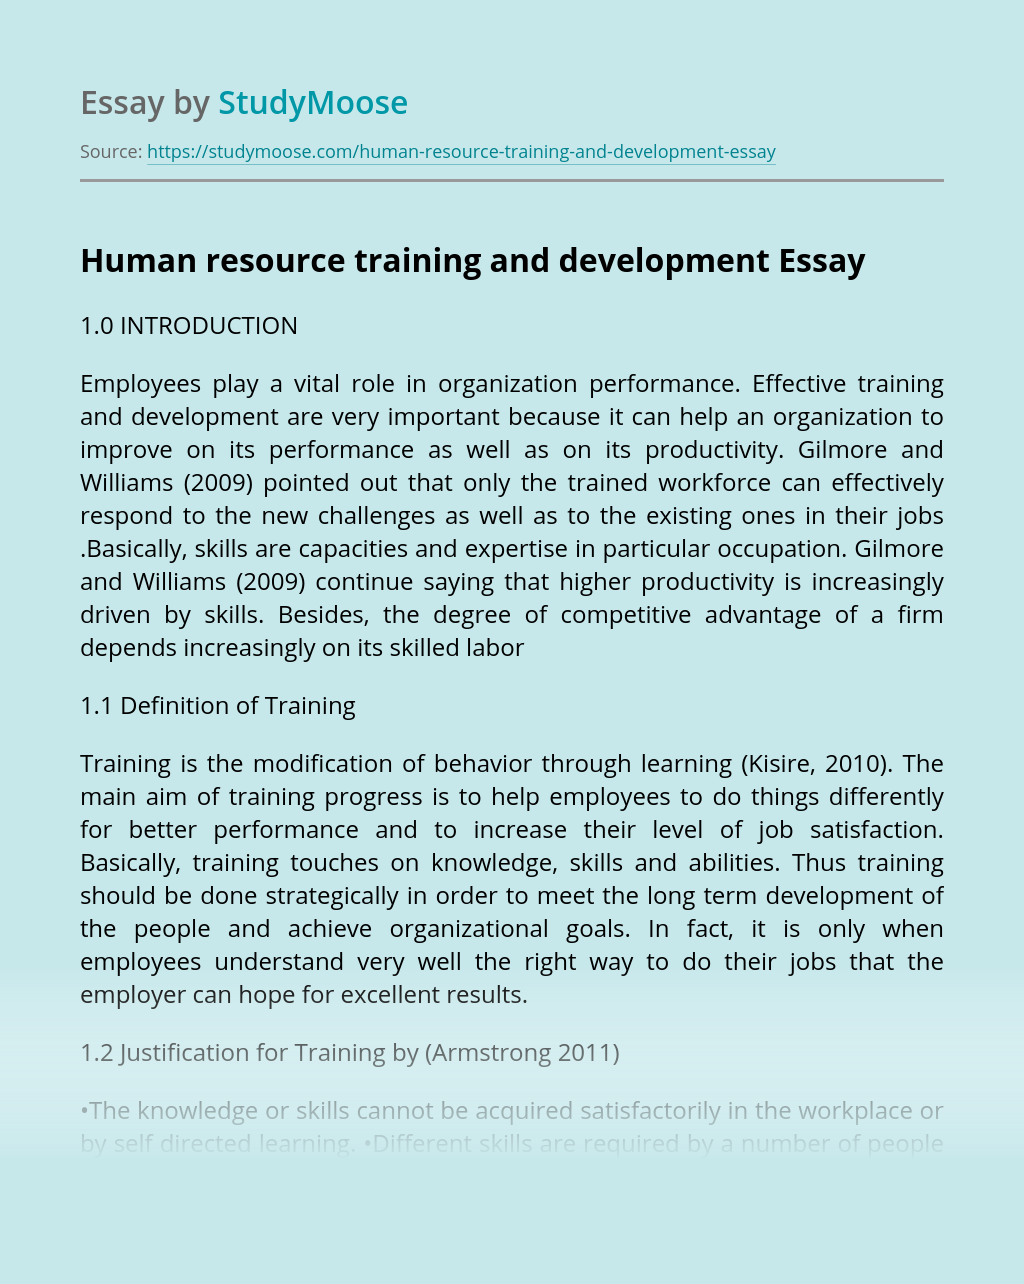 Human resource training and development